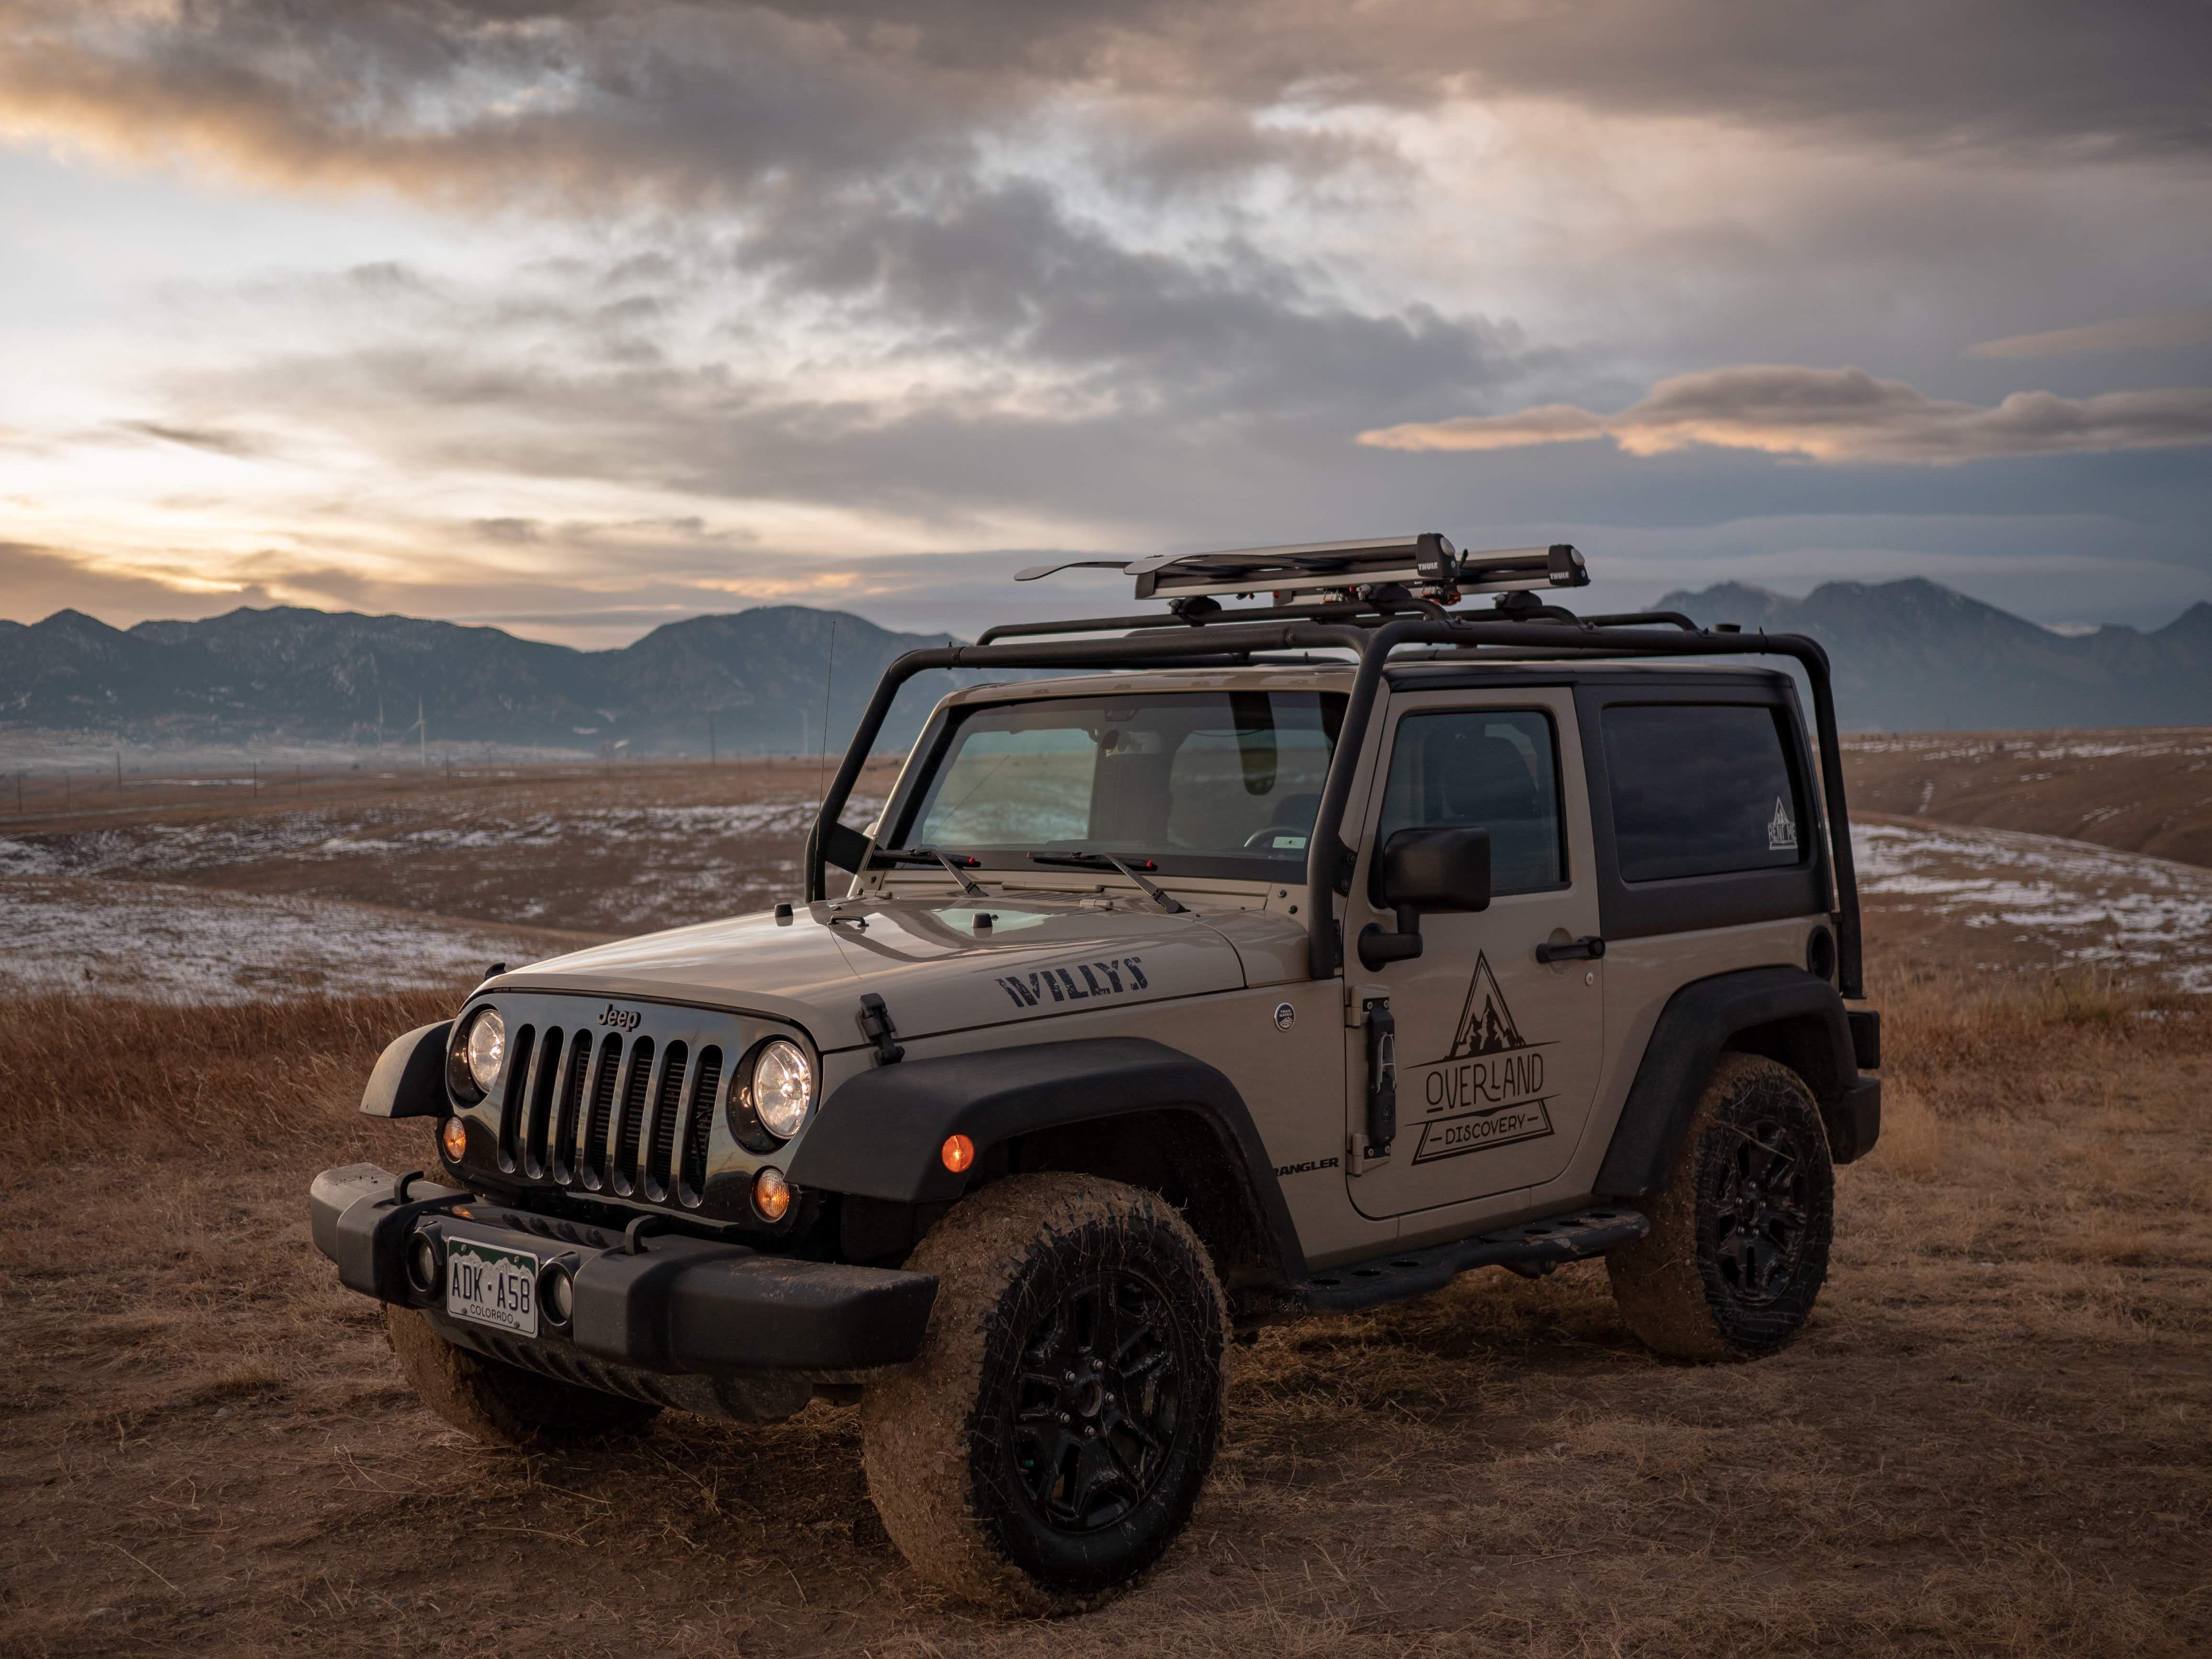 Overland Discovery Jeep Wrangler In 2020 Campervan Rental Jeep Wrangler Overlanding